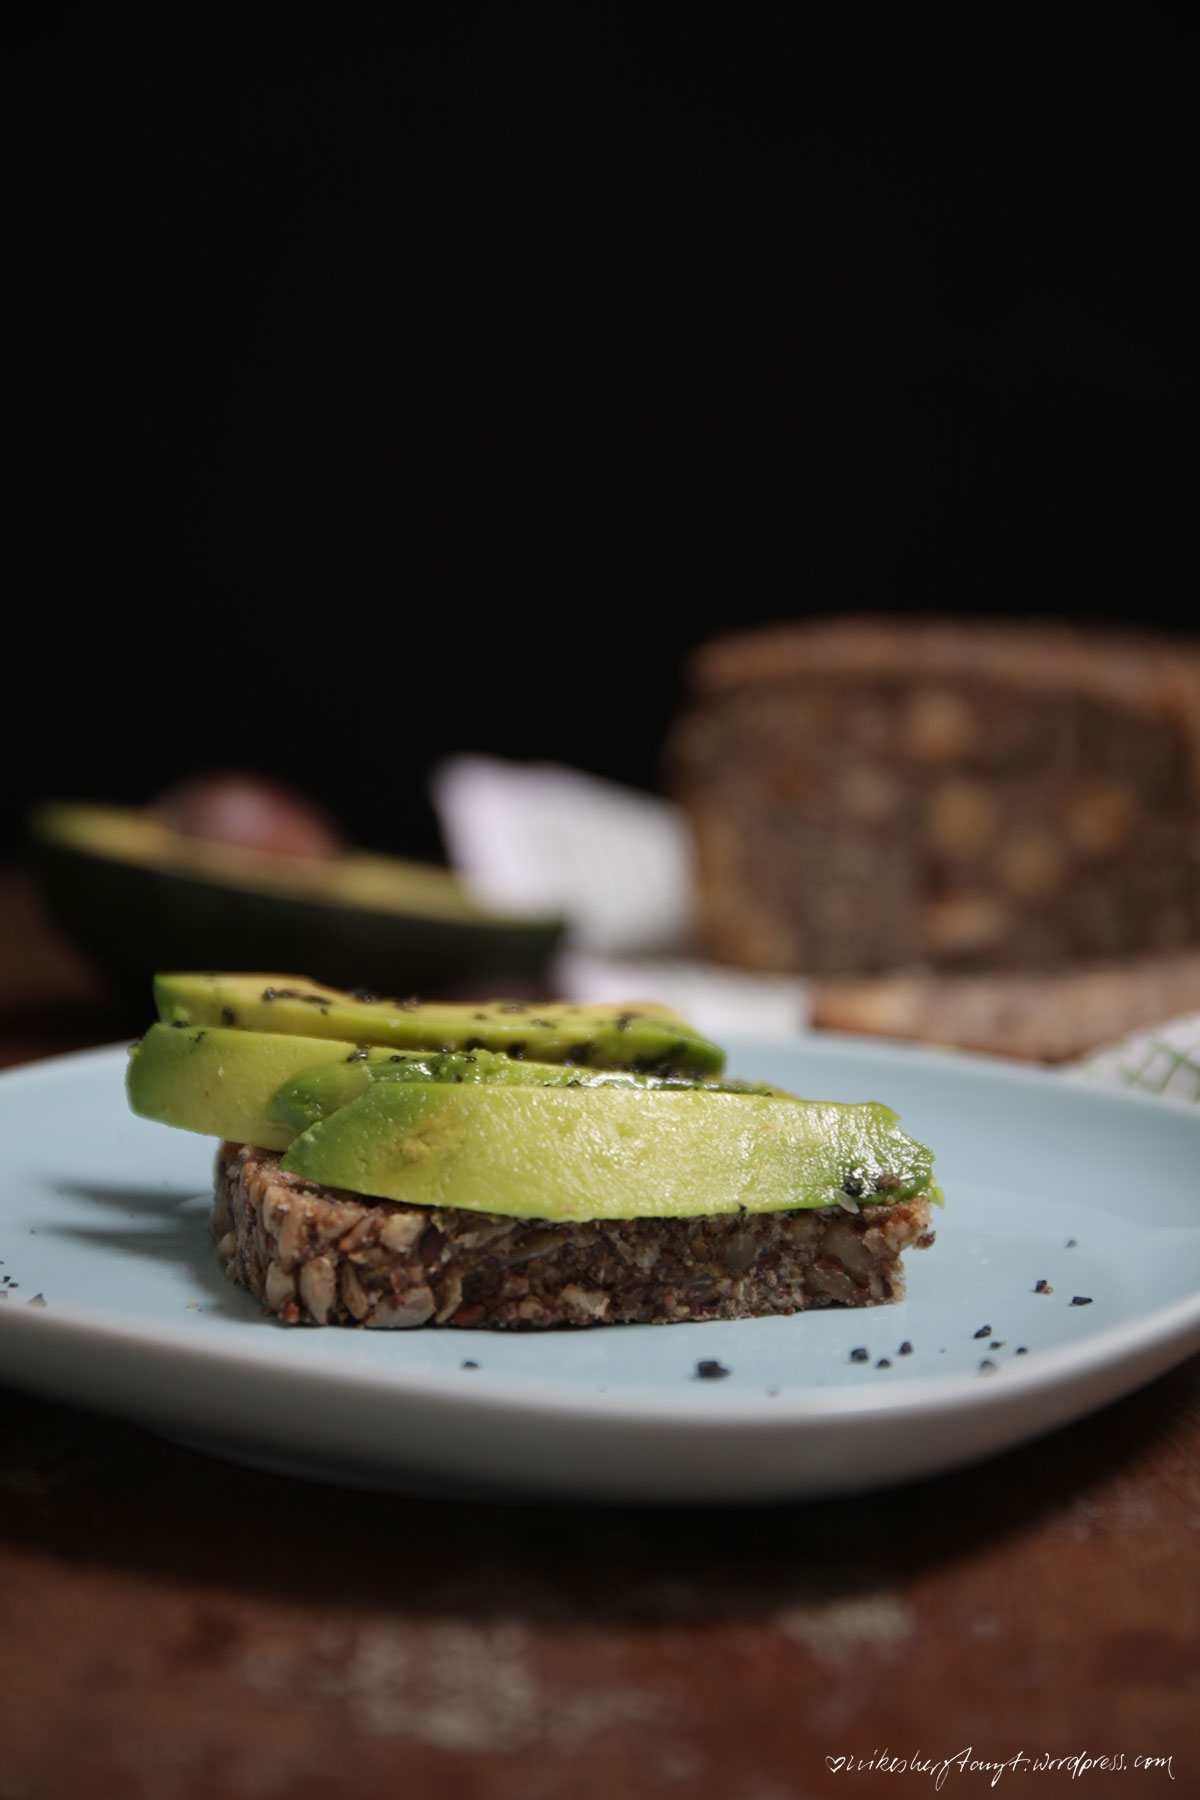 lifechanging bread, körner, brot, vegan, brotzeit, cleaneating, nikesherztanzt, avocado, avocadobrot